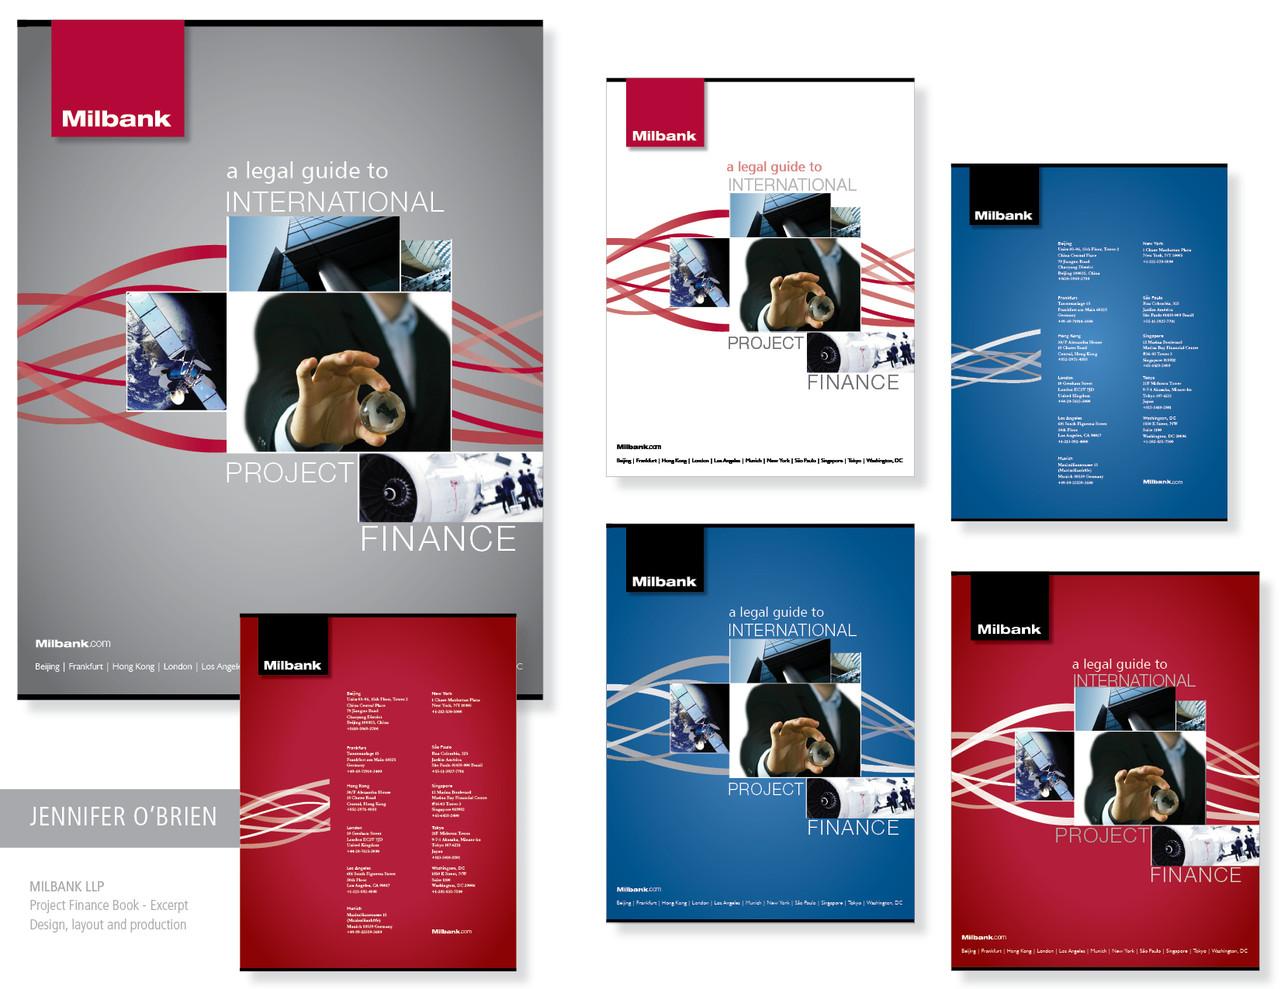 MILBANK_PF_BOOK COVERS.jpg